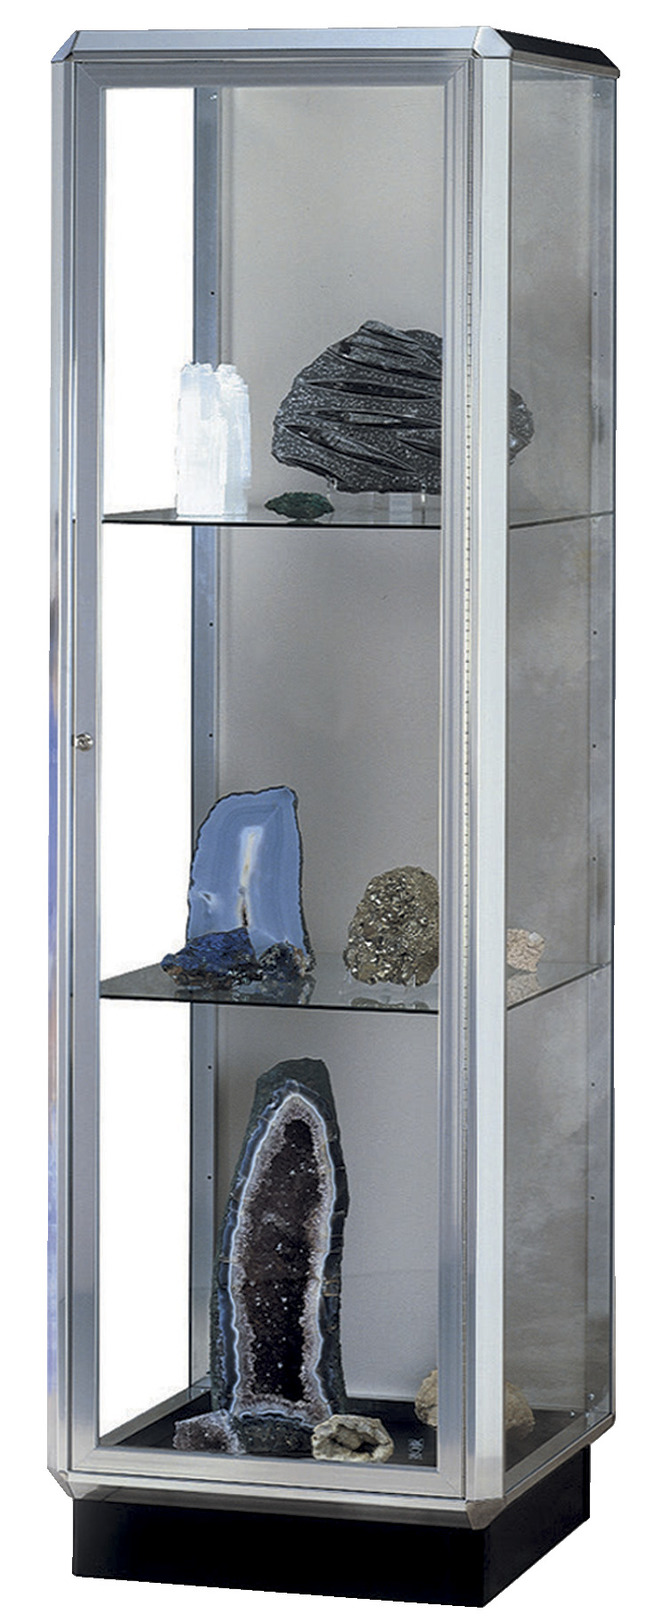 Trophy Cases, Display Cases Supplies, Item Number 673023